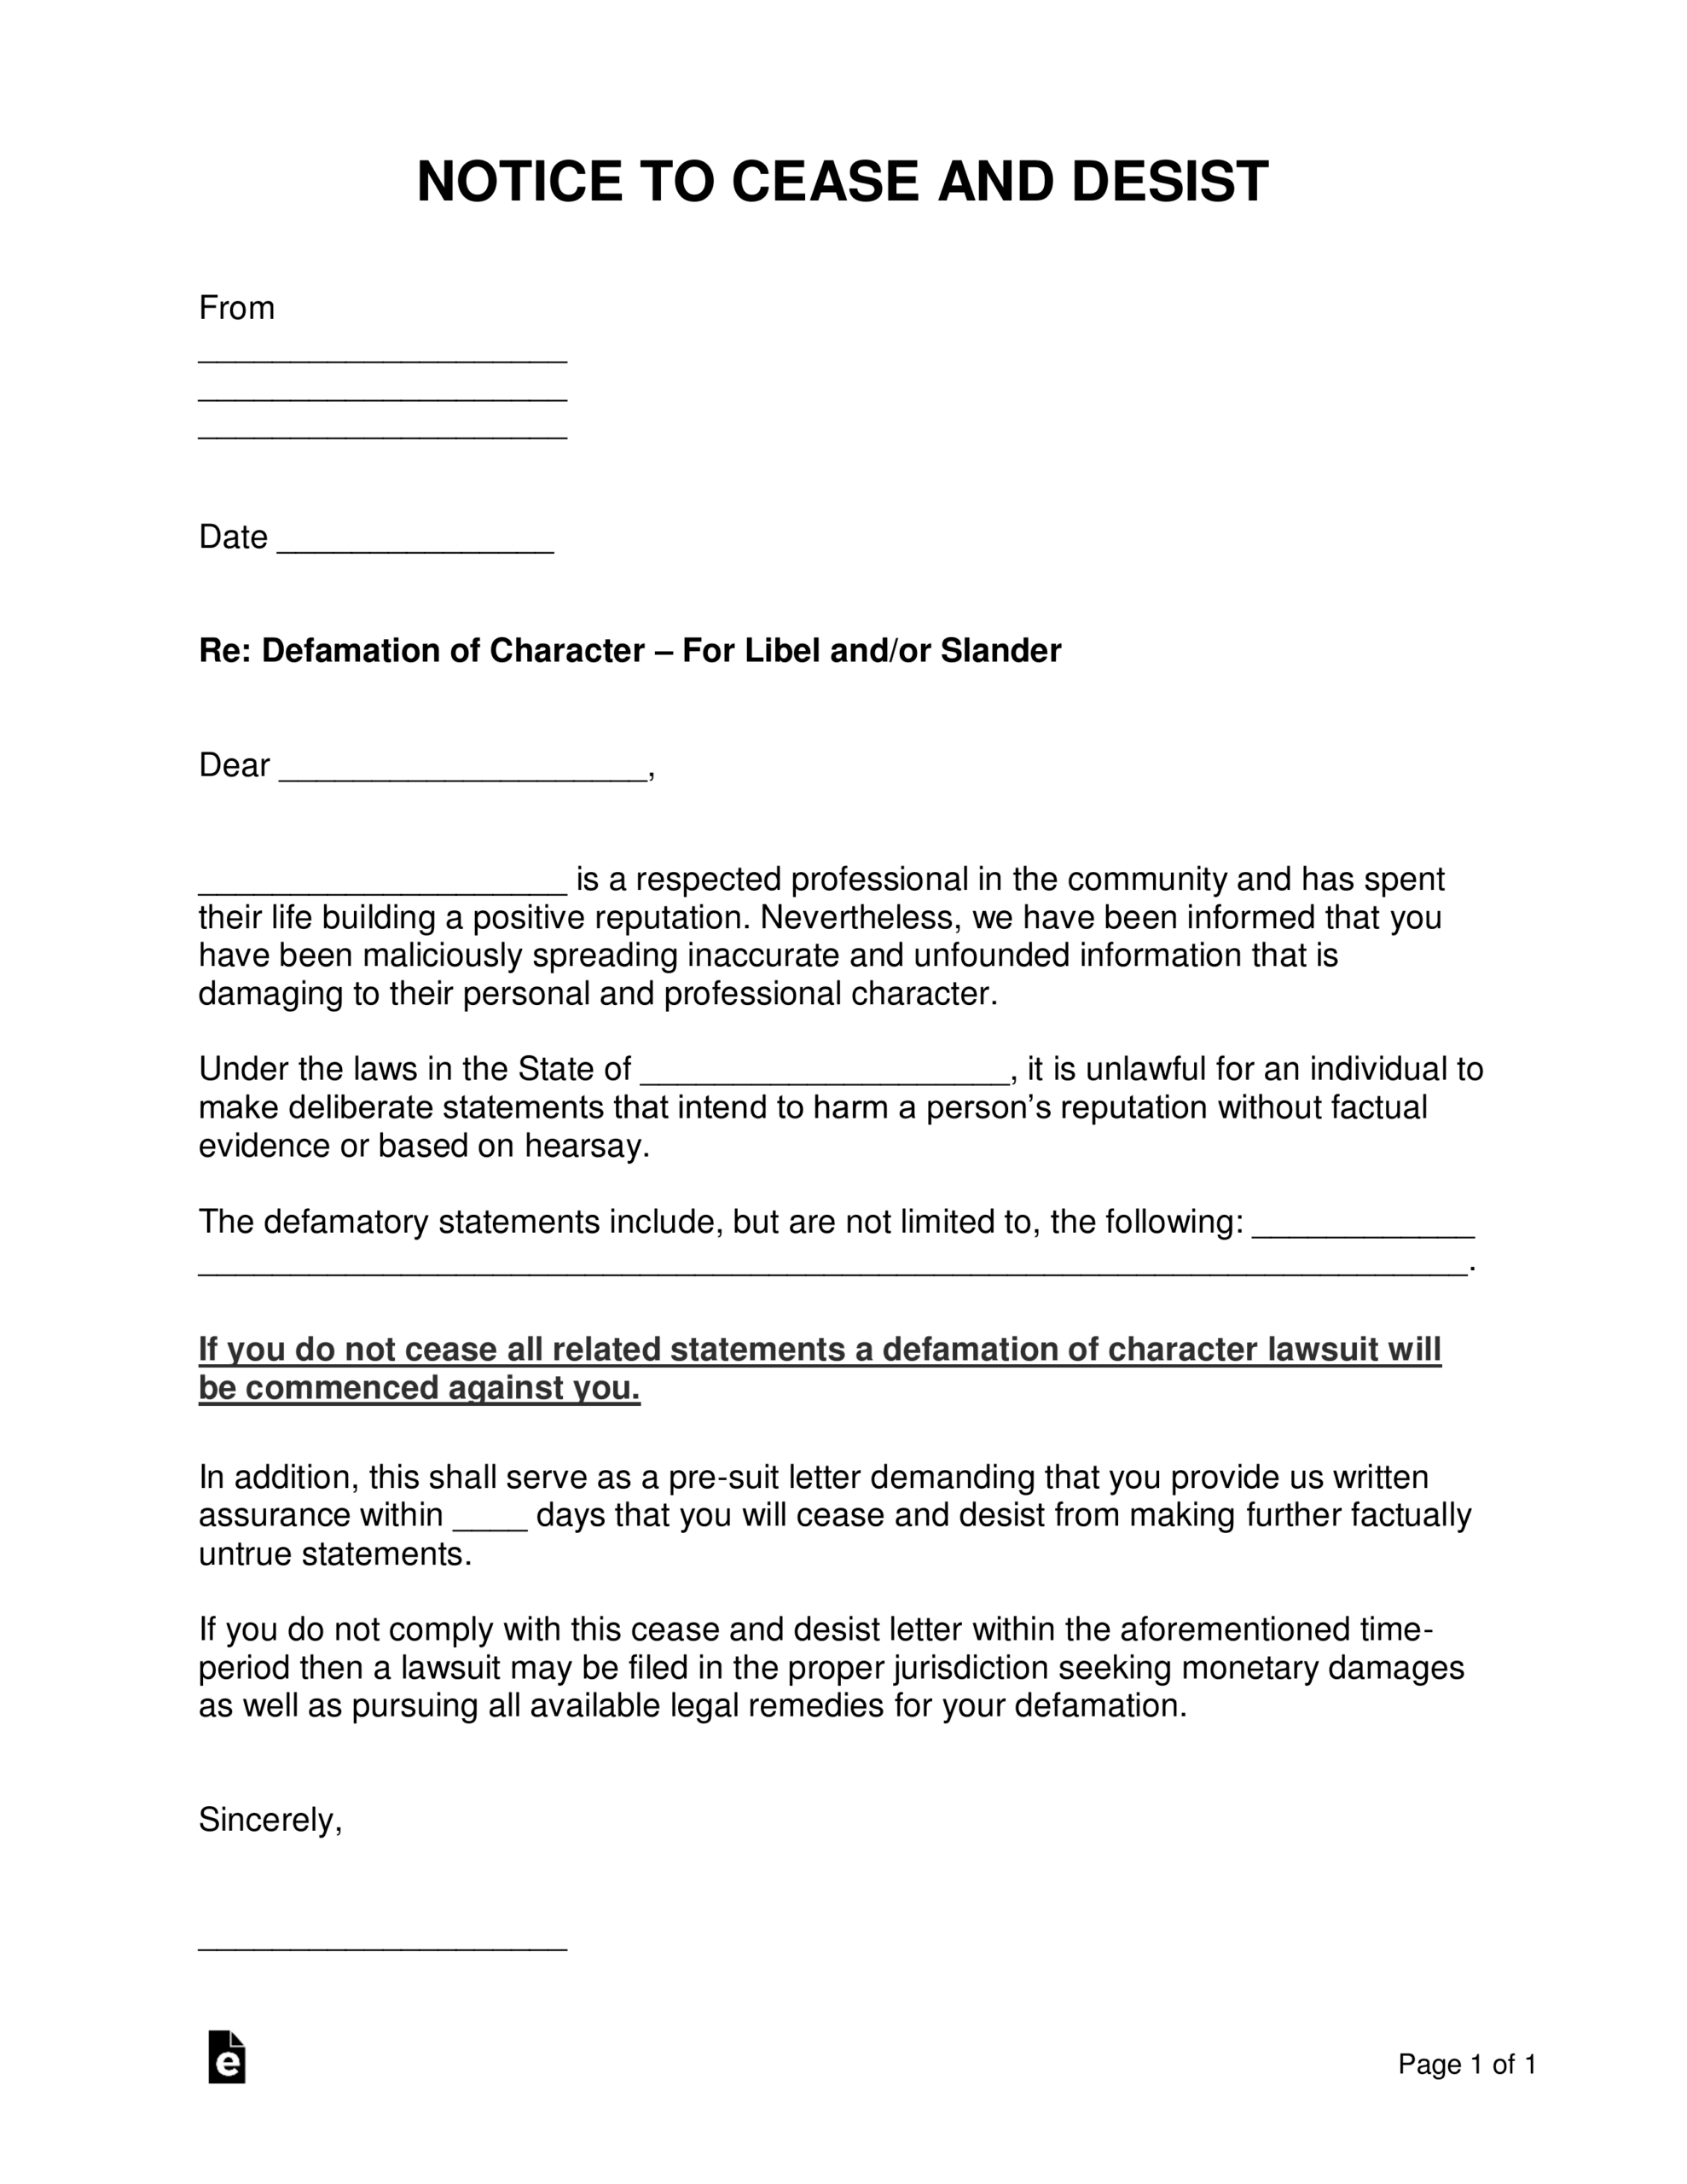 Free Defamation (Slander / Libel) Cease And Desist Letter Intended For Cease And Desist Letter Template Defamation